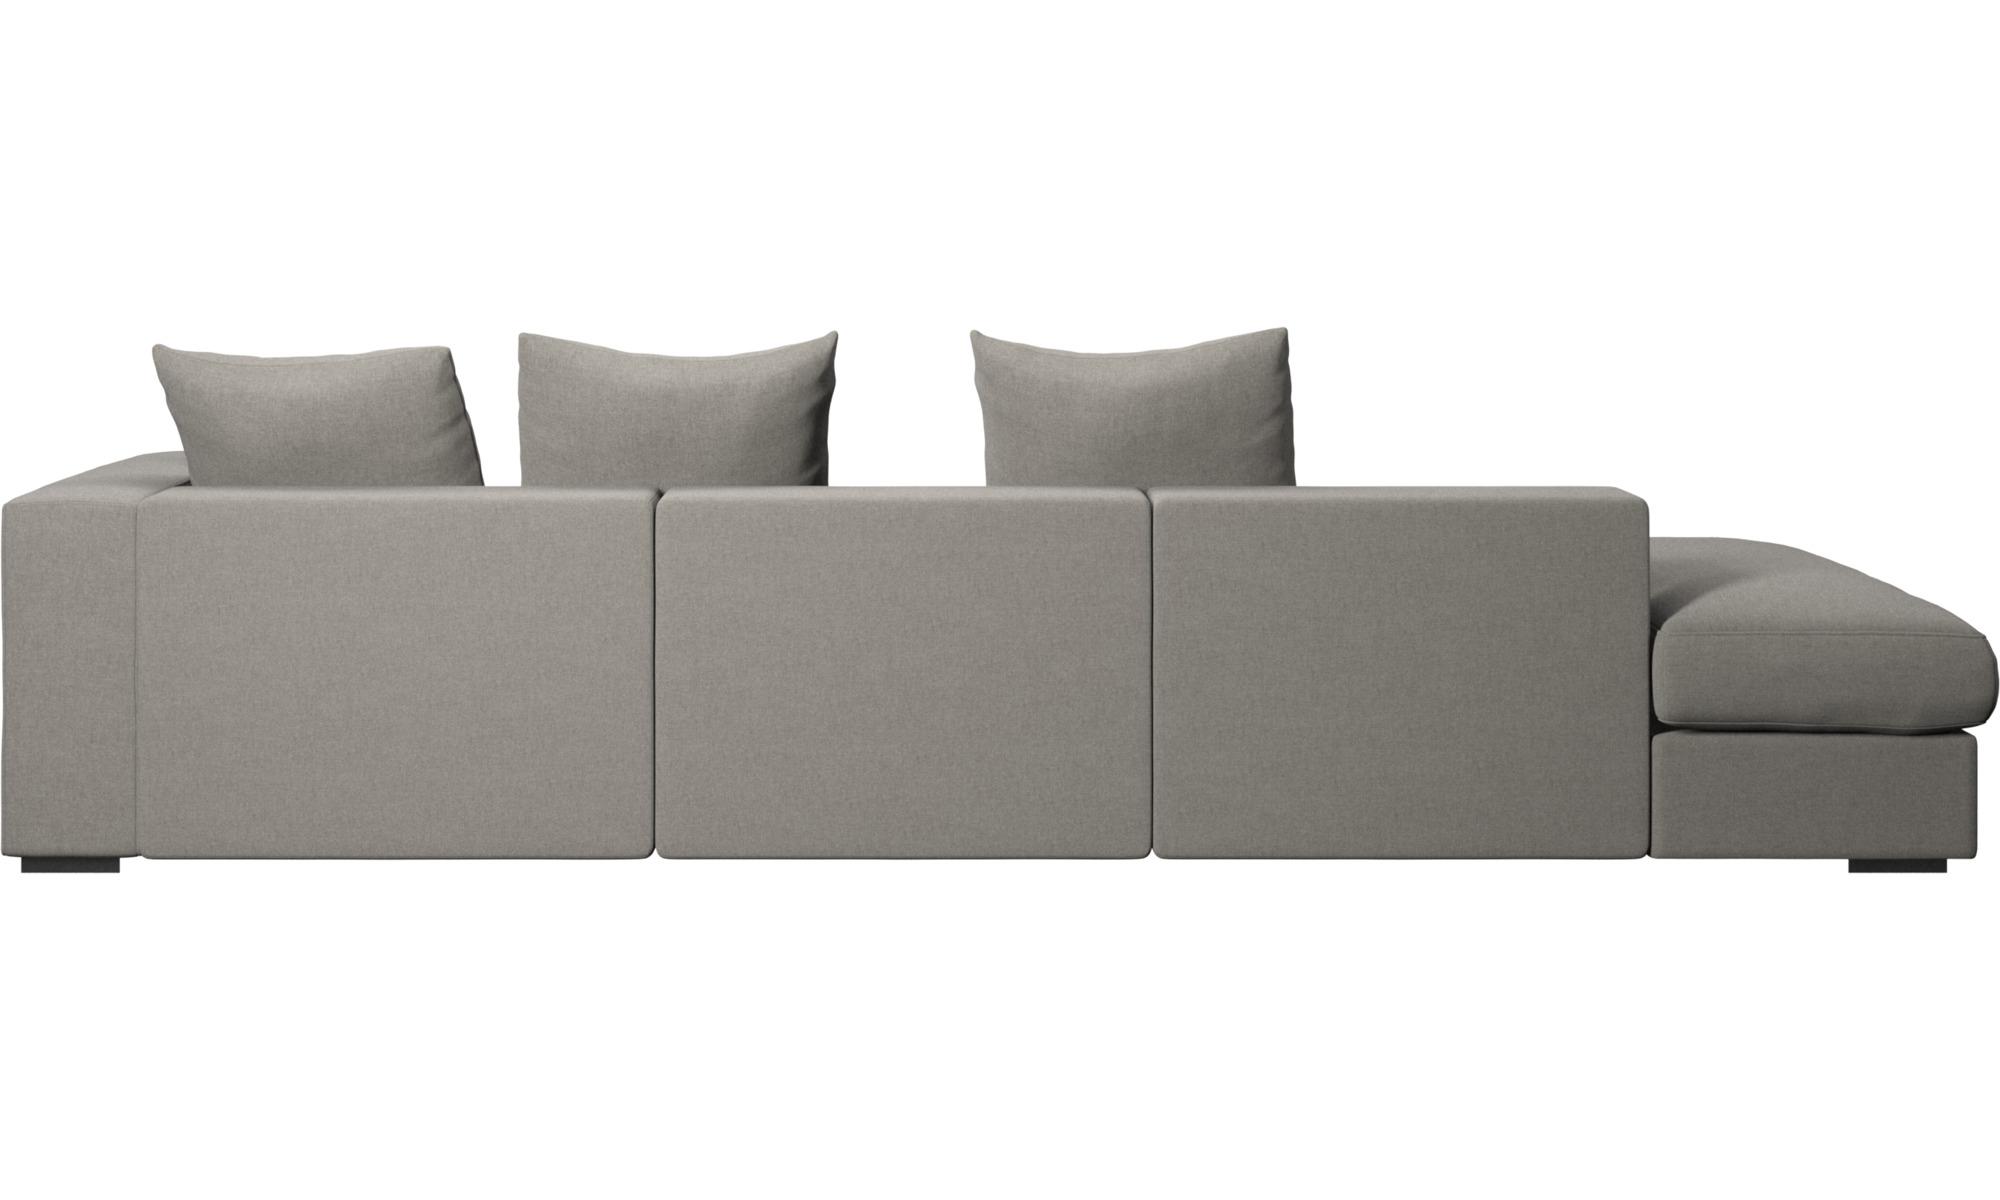 3-sitzer Sofas - Cenova Sofa mit Lounge- und Ruhemodul - BoConcept